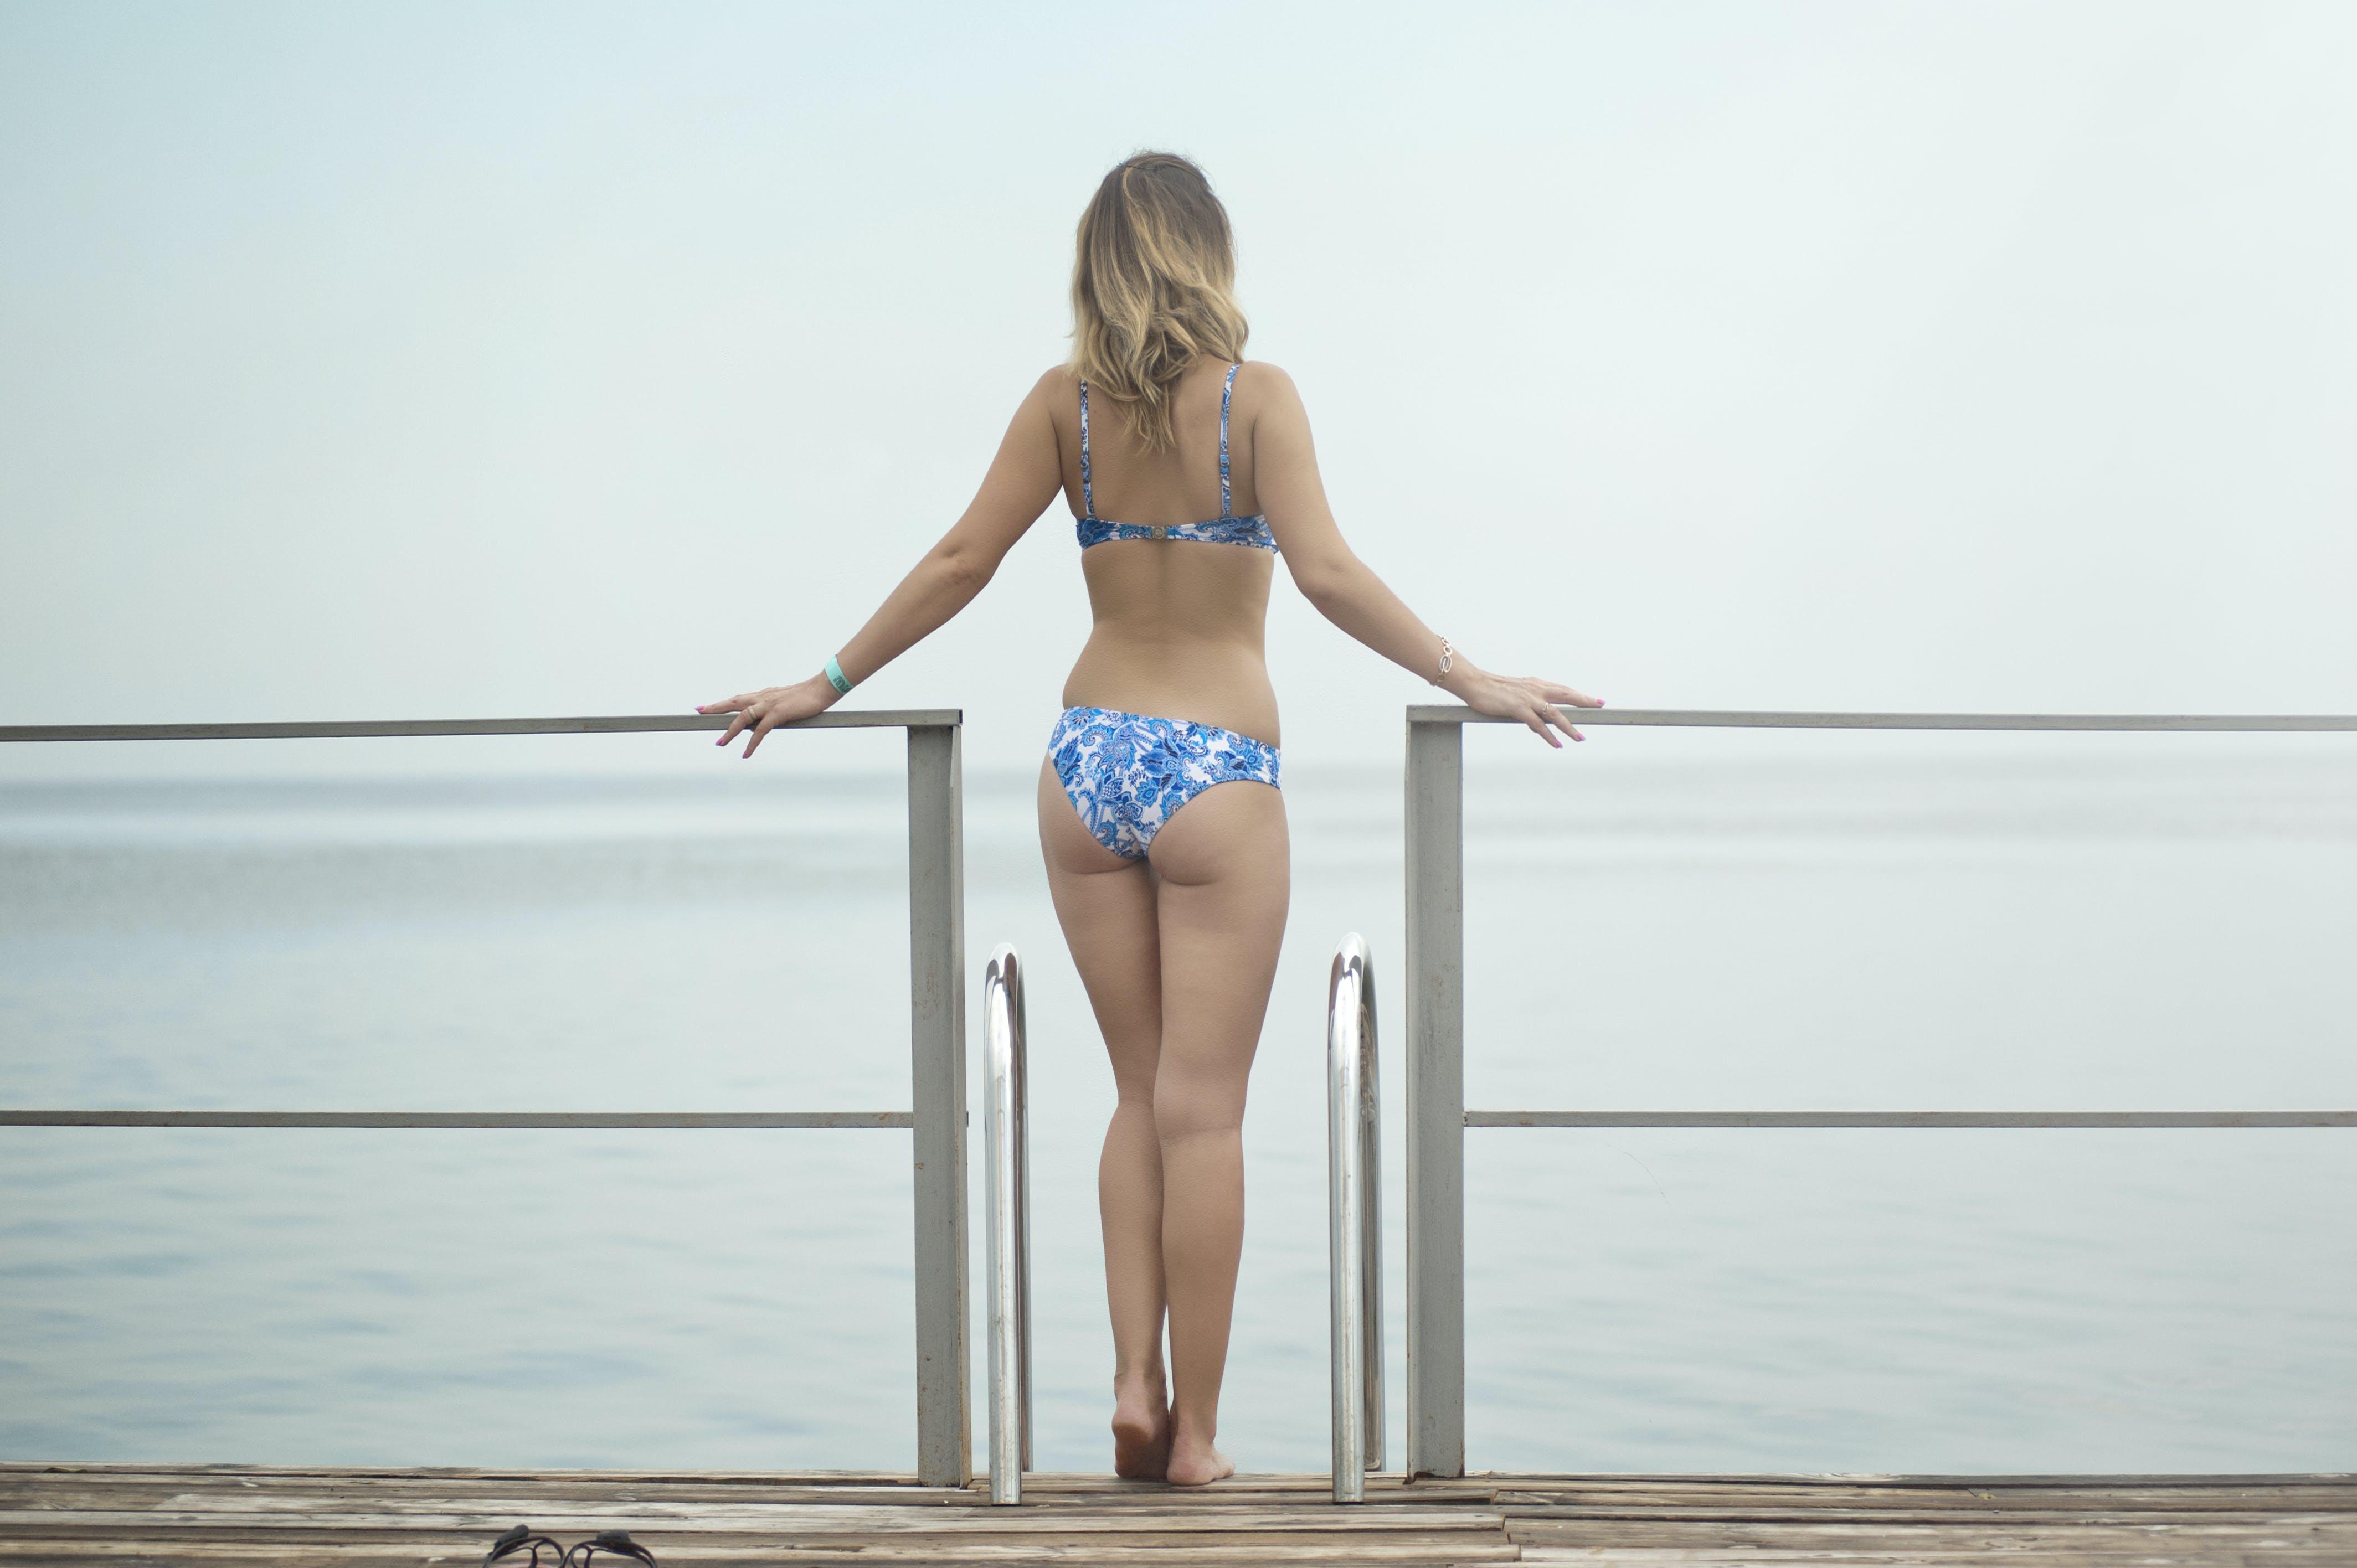 Photography of a Woman Wearing Blue Bikini